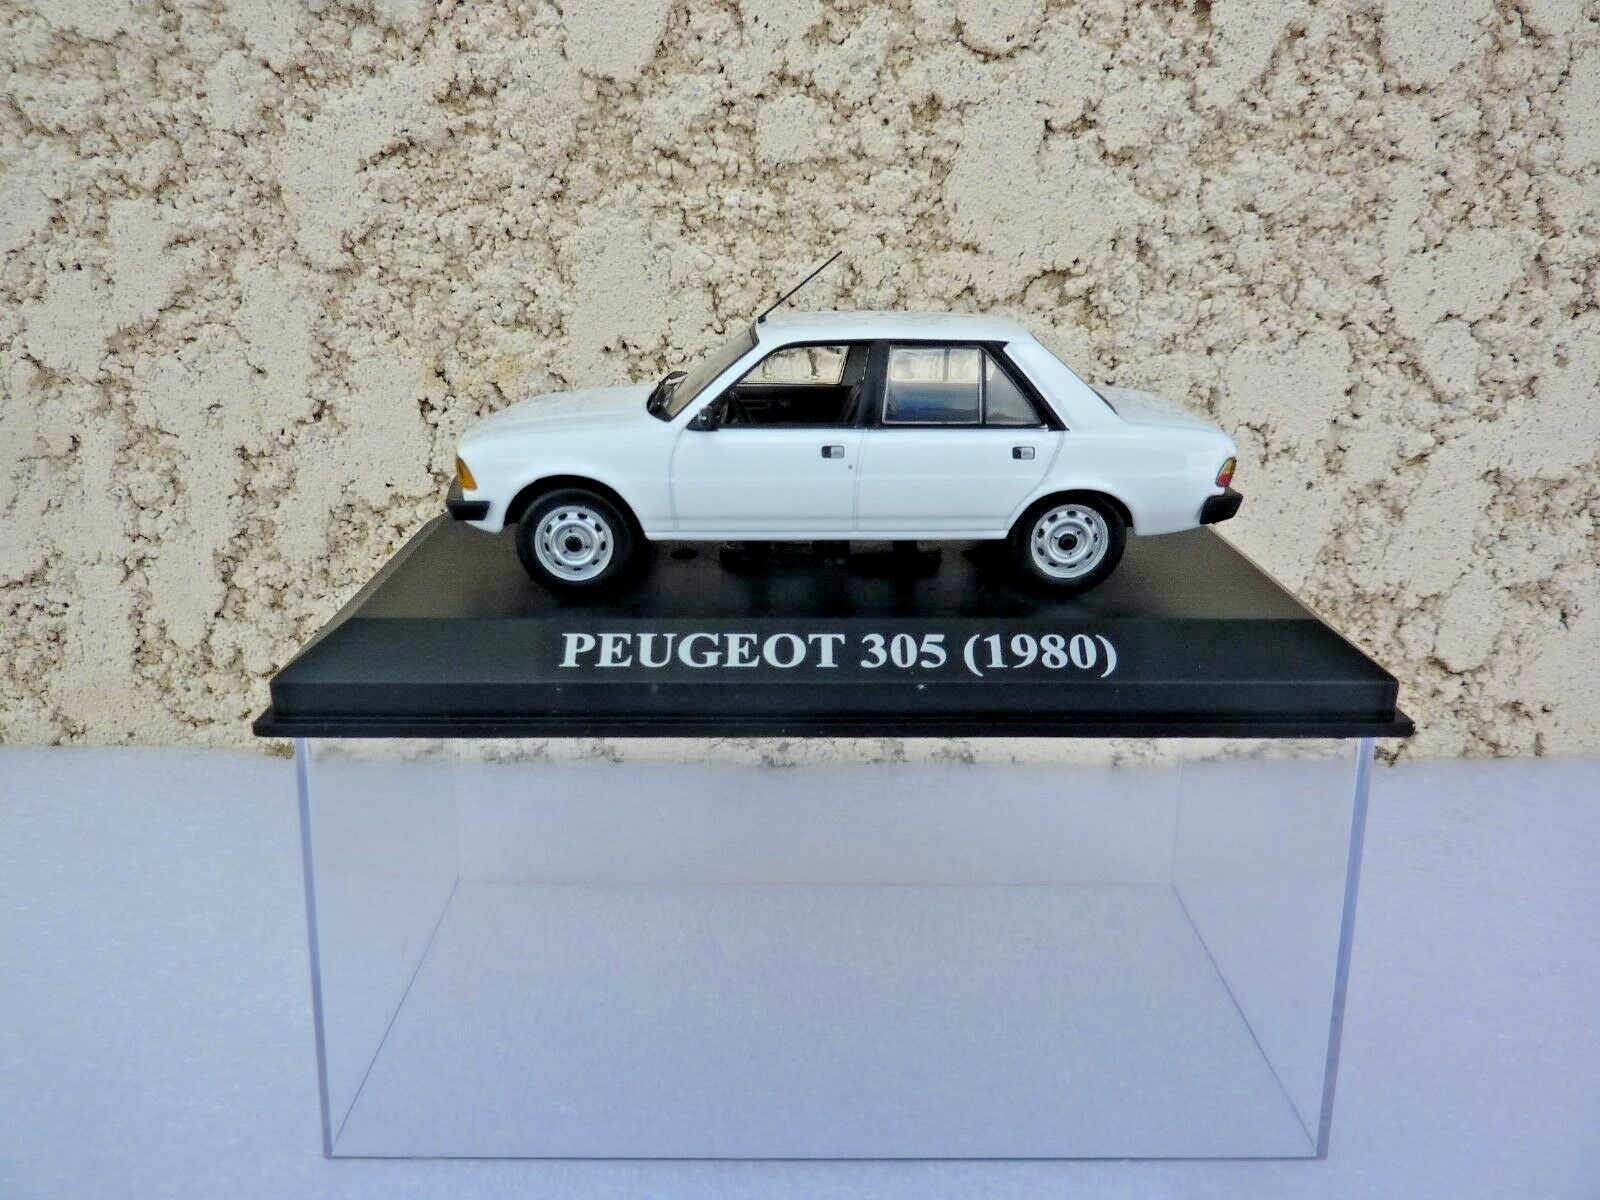 Peugeot 305 GL Blanche 1980 ixo pour altaya altaya altaya   1 43 91b780